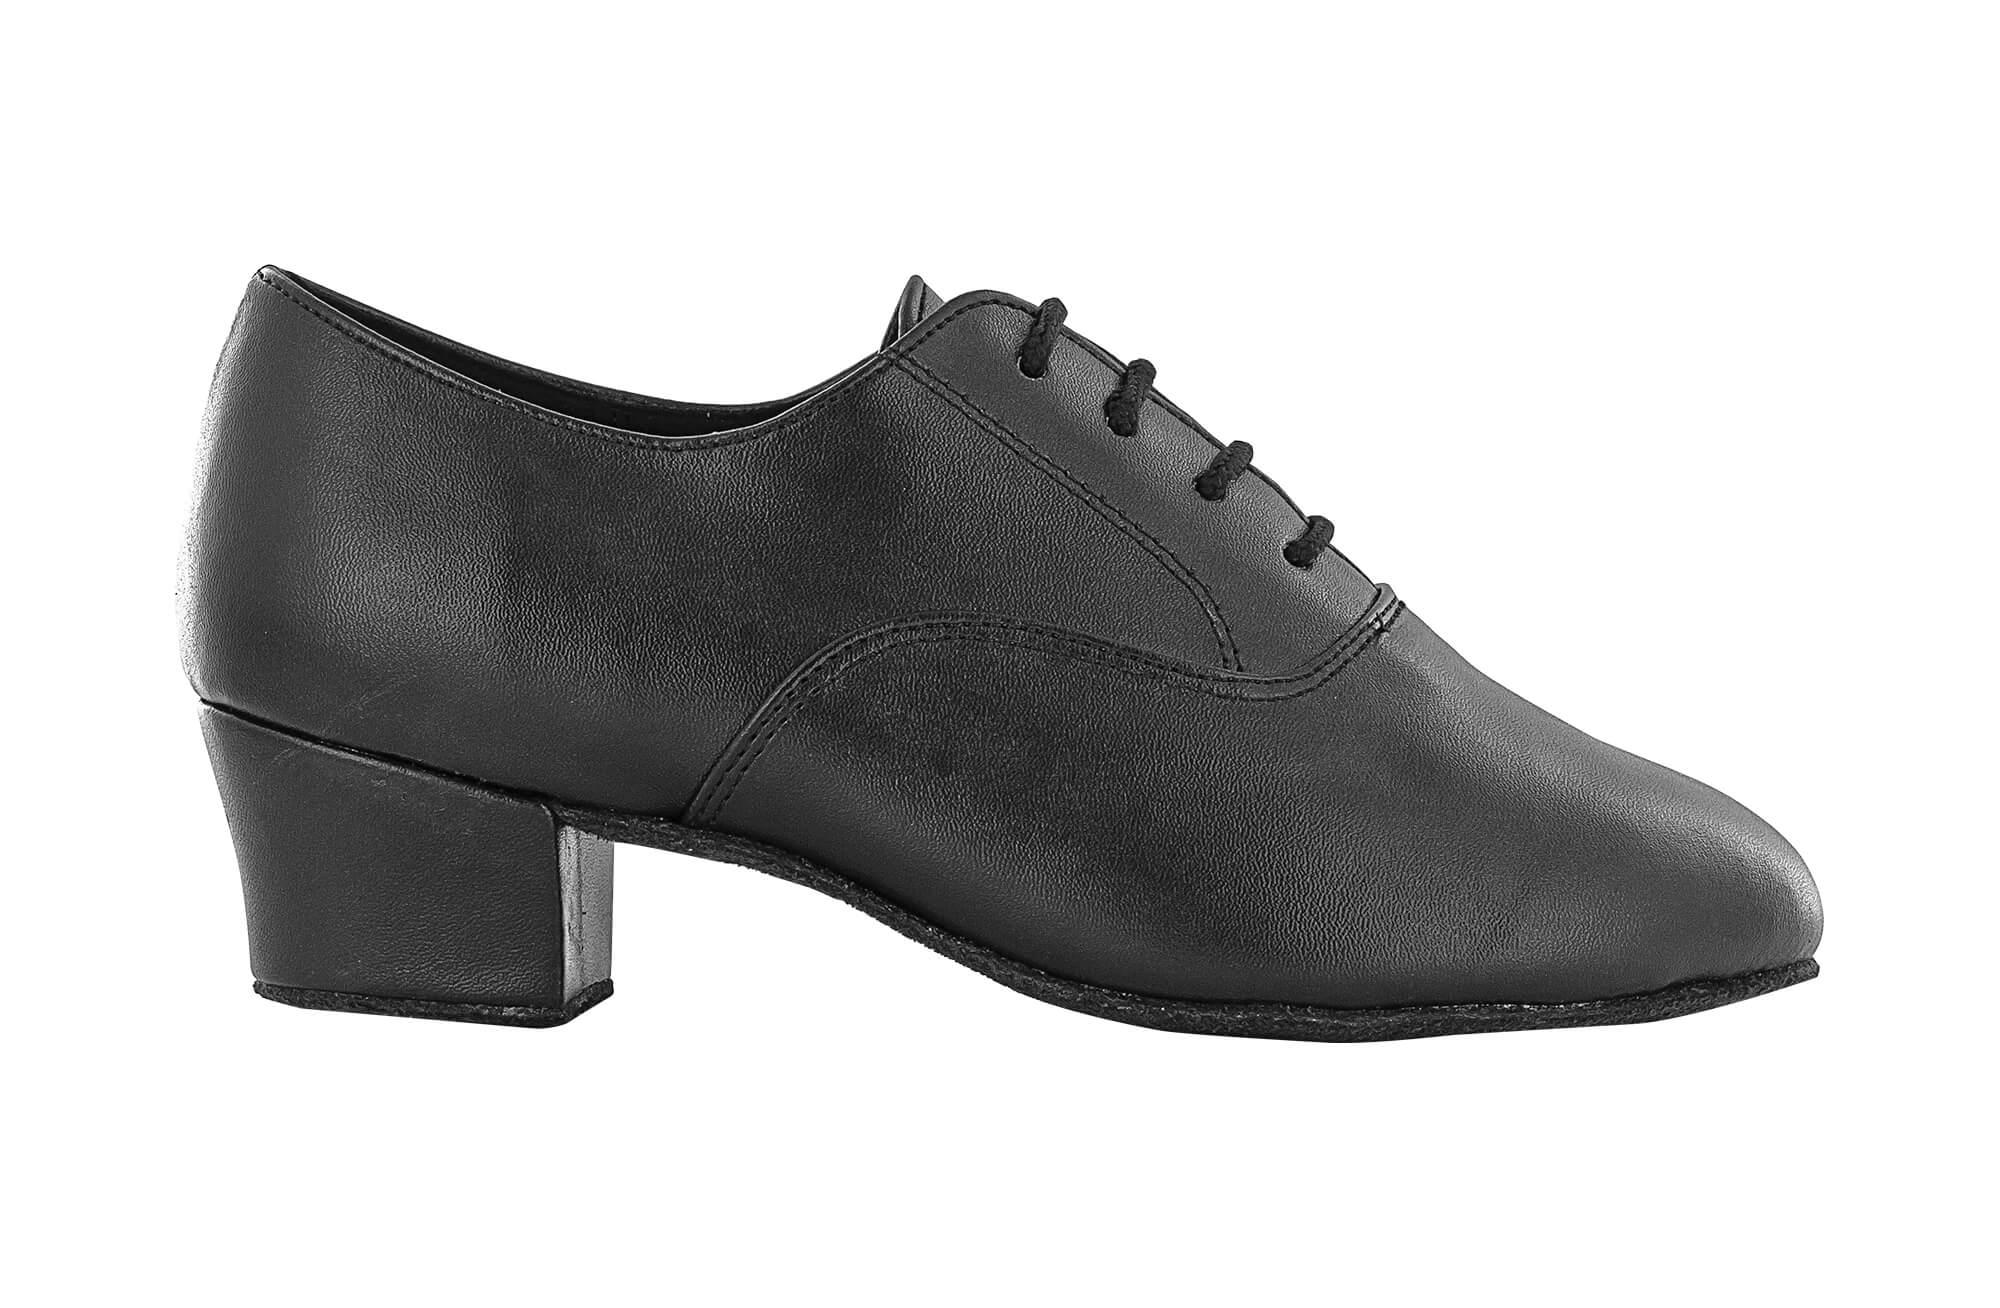 Zapato de baile Danc'in Negro con Tacón de 3'5cm